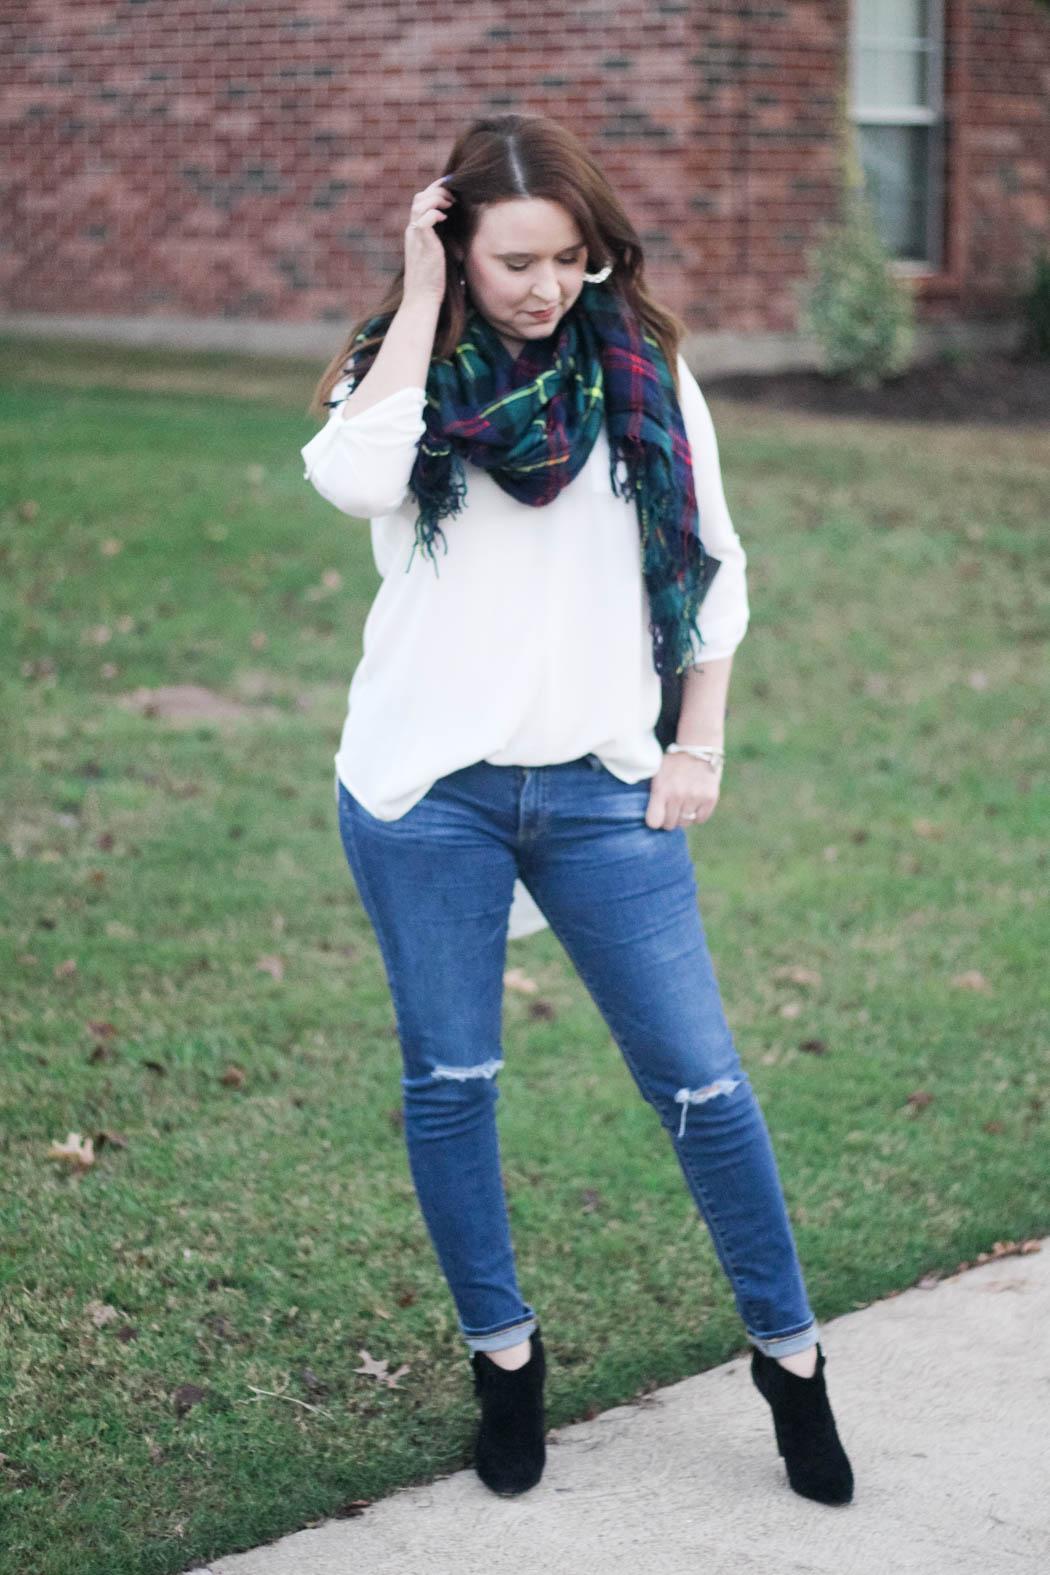 target-scarf-lush-tunic-ag-jeans-coach-bag-charles-david-booties-4